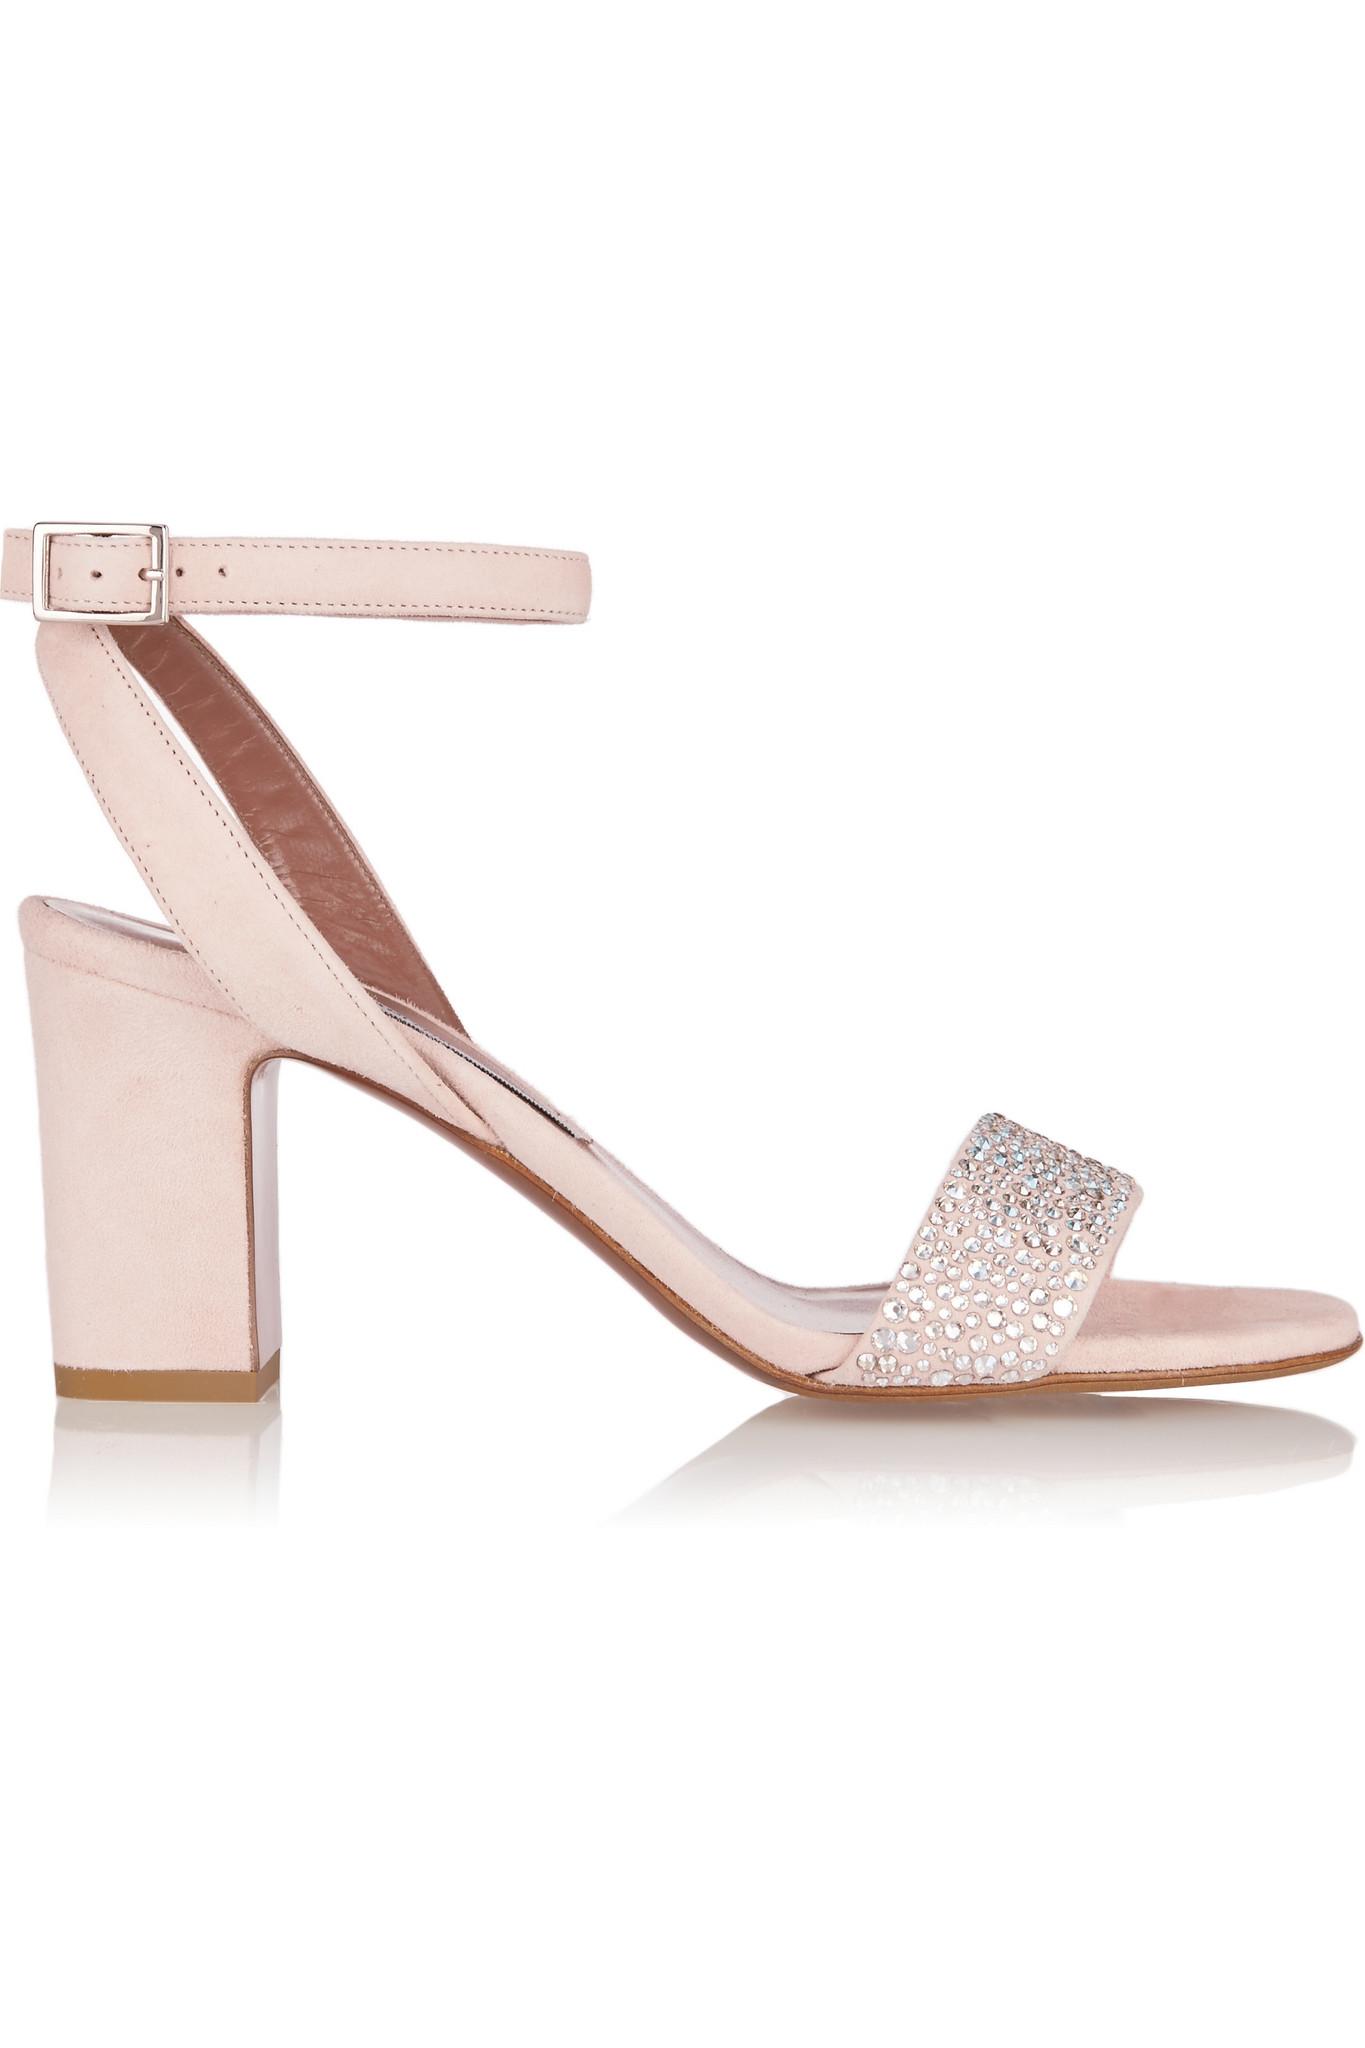 Tabitha Simmons Wedding Shoes